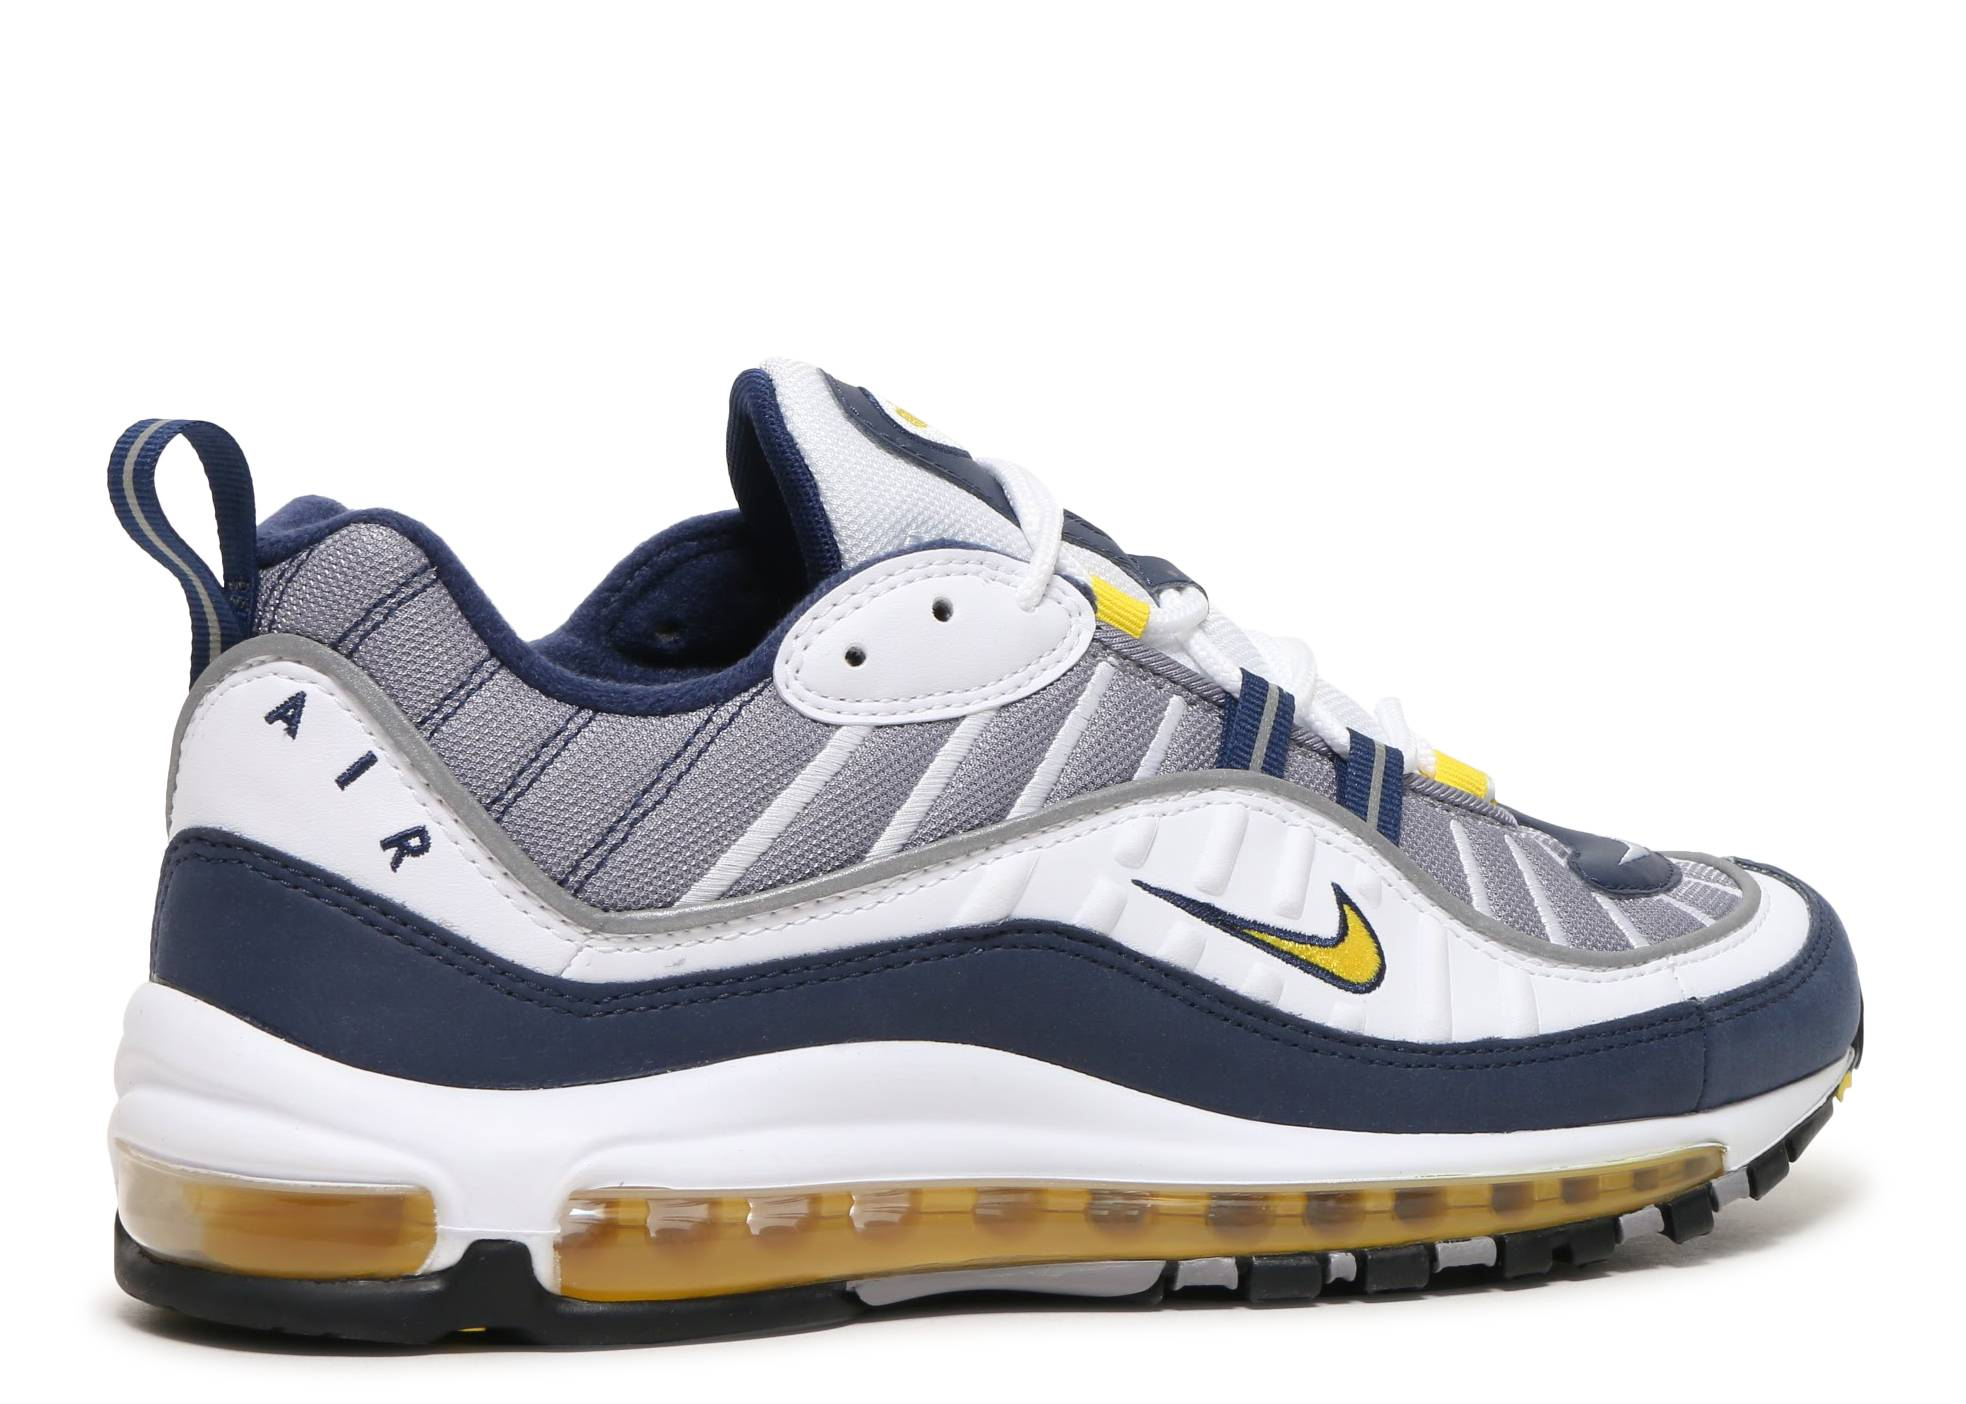 67c560e13b0e4d AIr Max 98 - Nike - 640744 105 - white tour yellow-midnight navy-cement grey